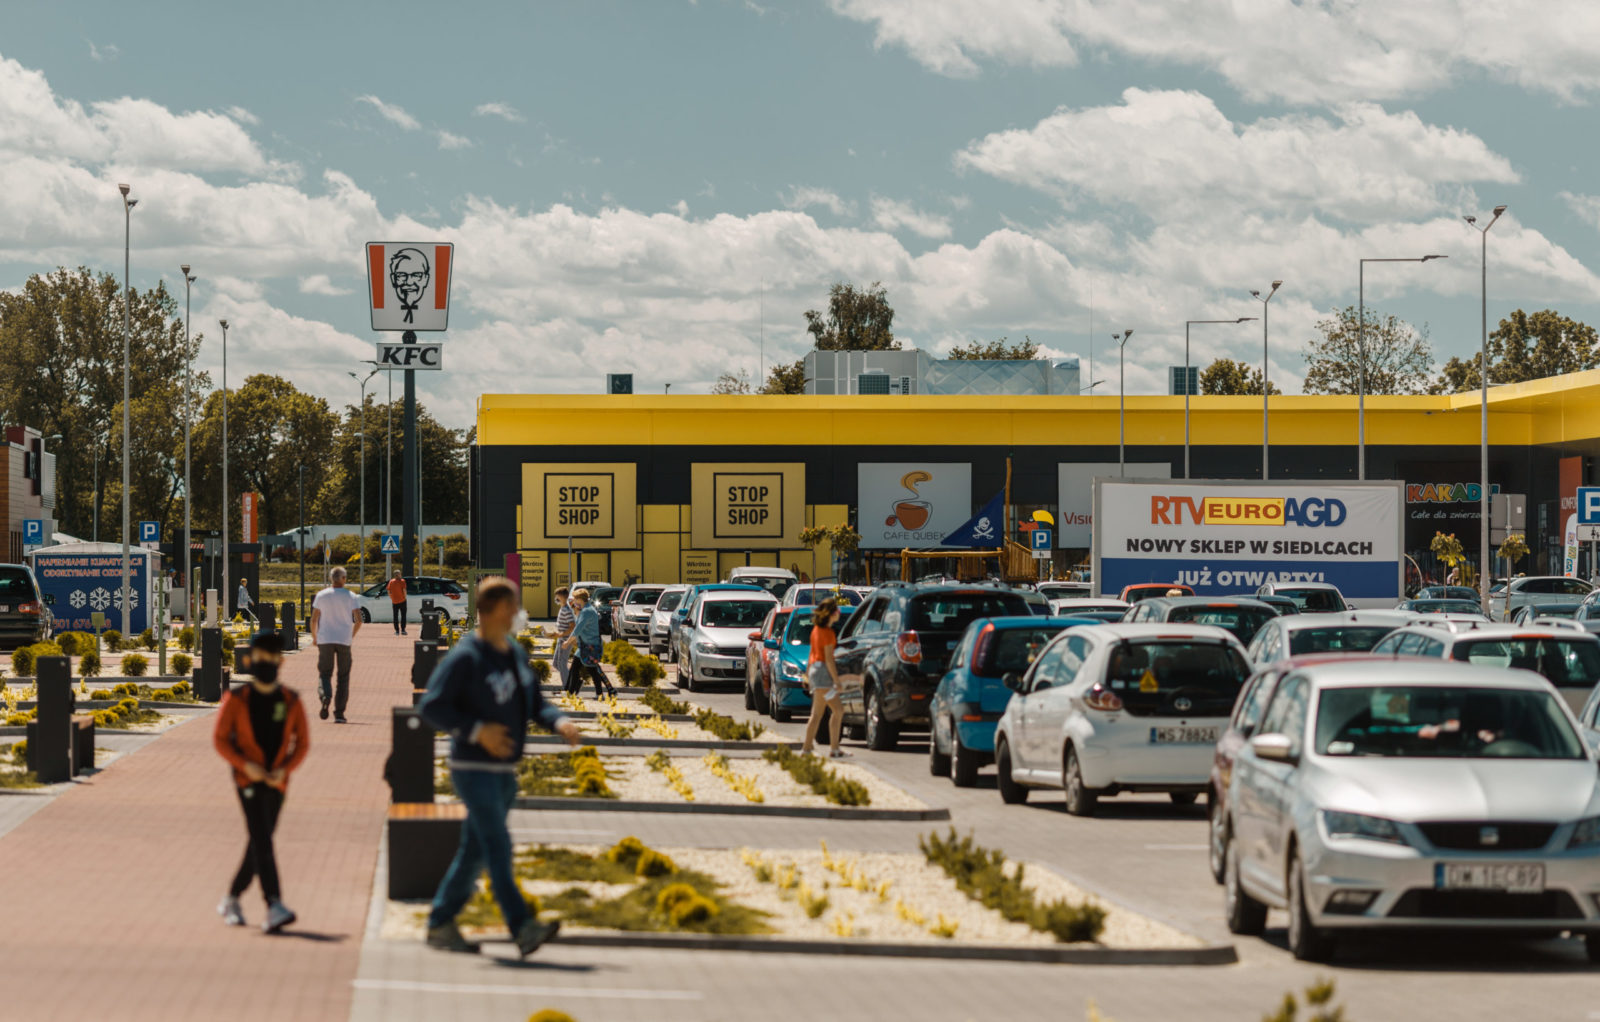 Retail park in Siedlce